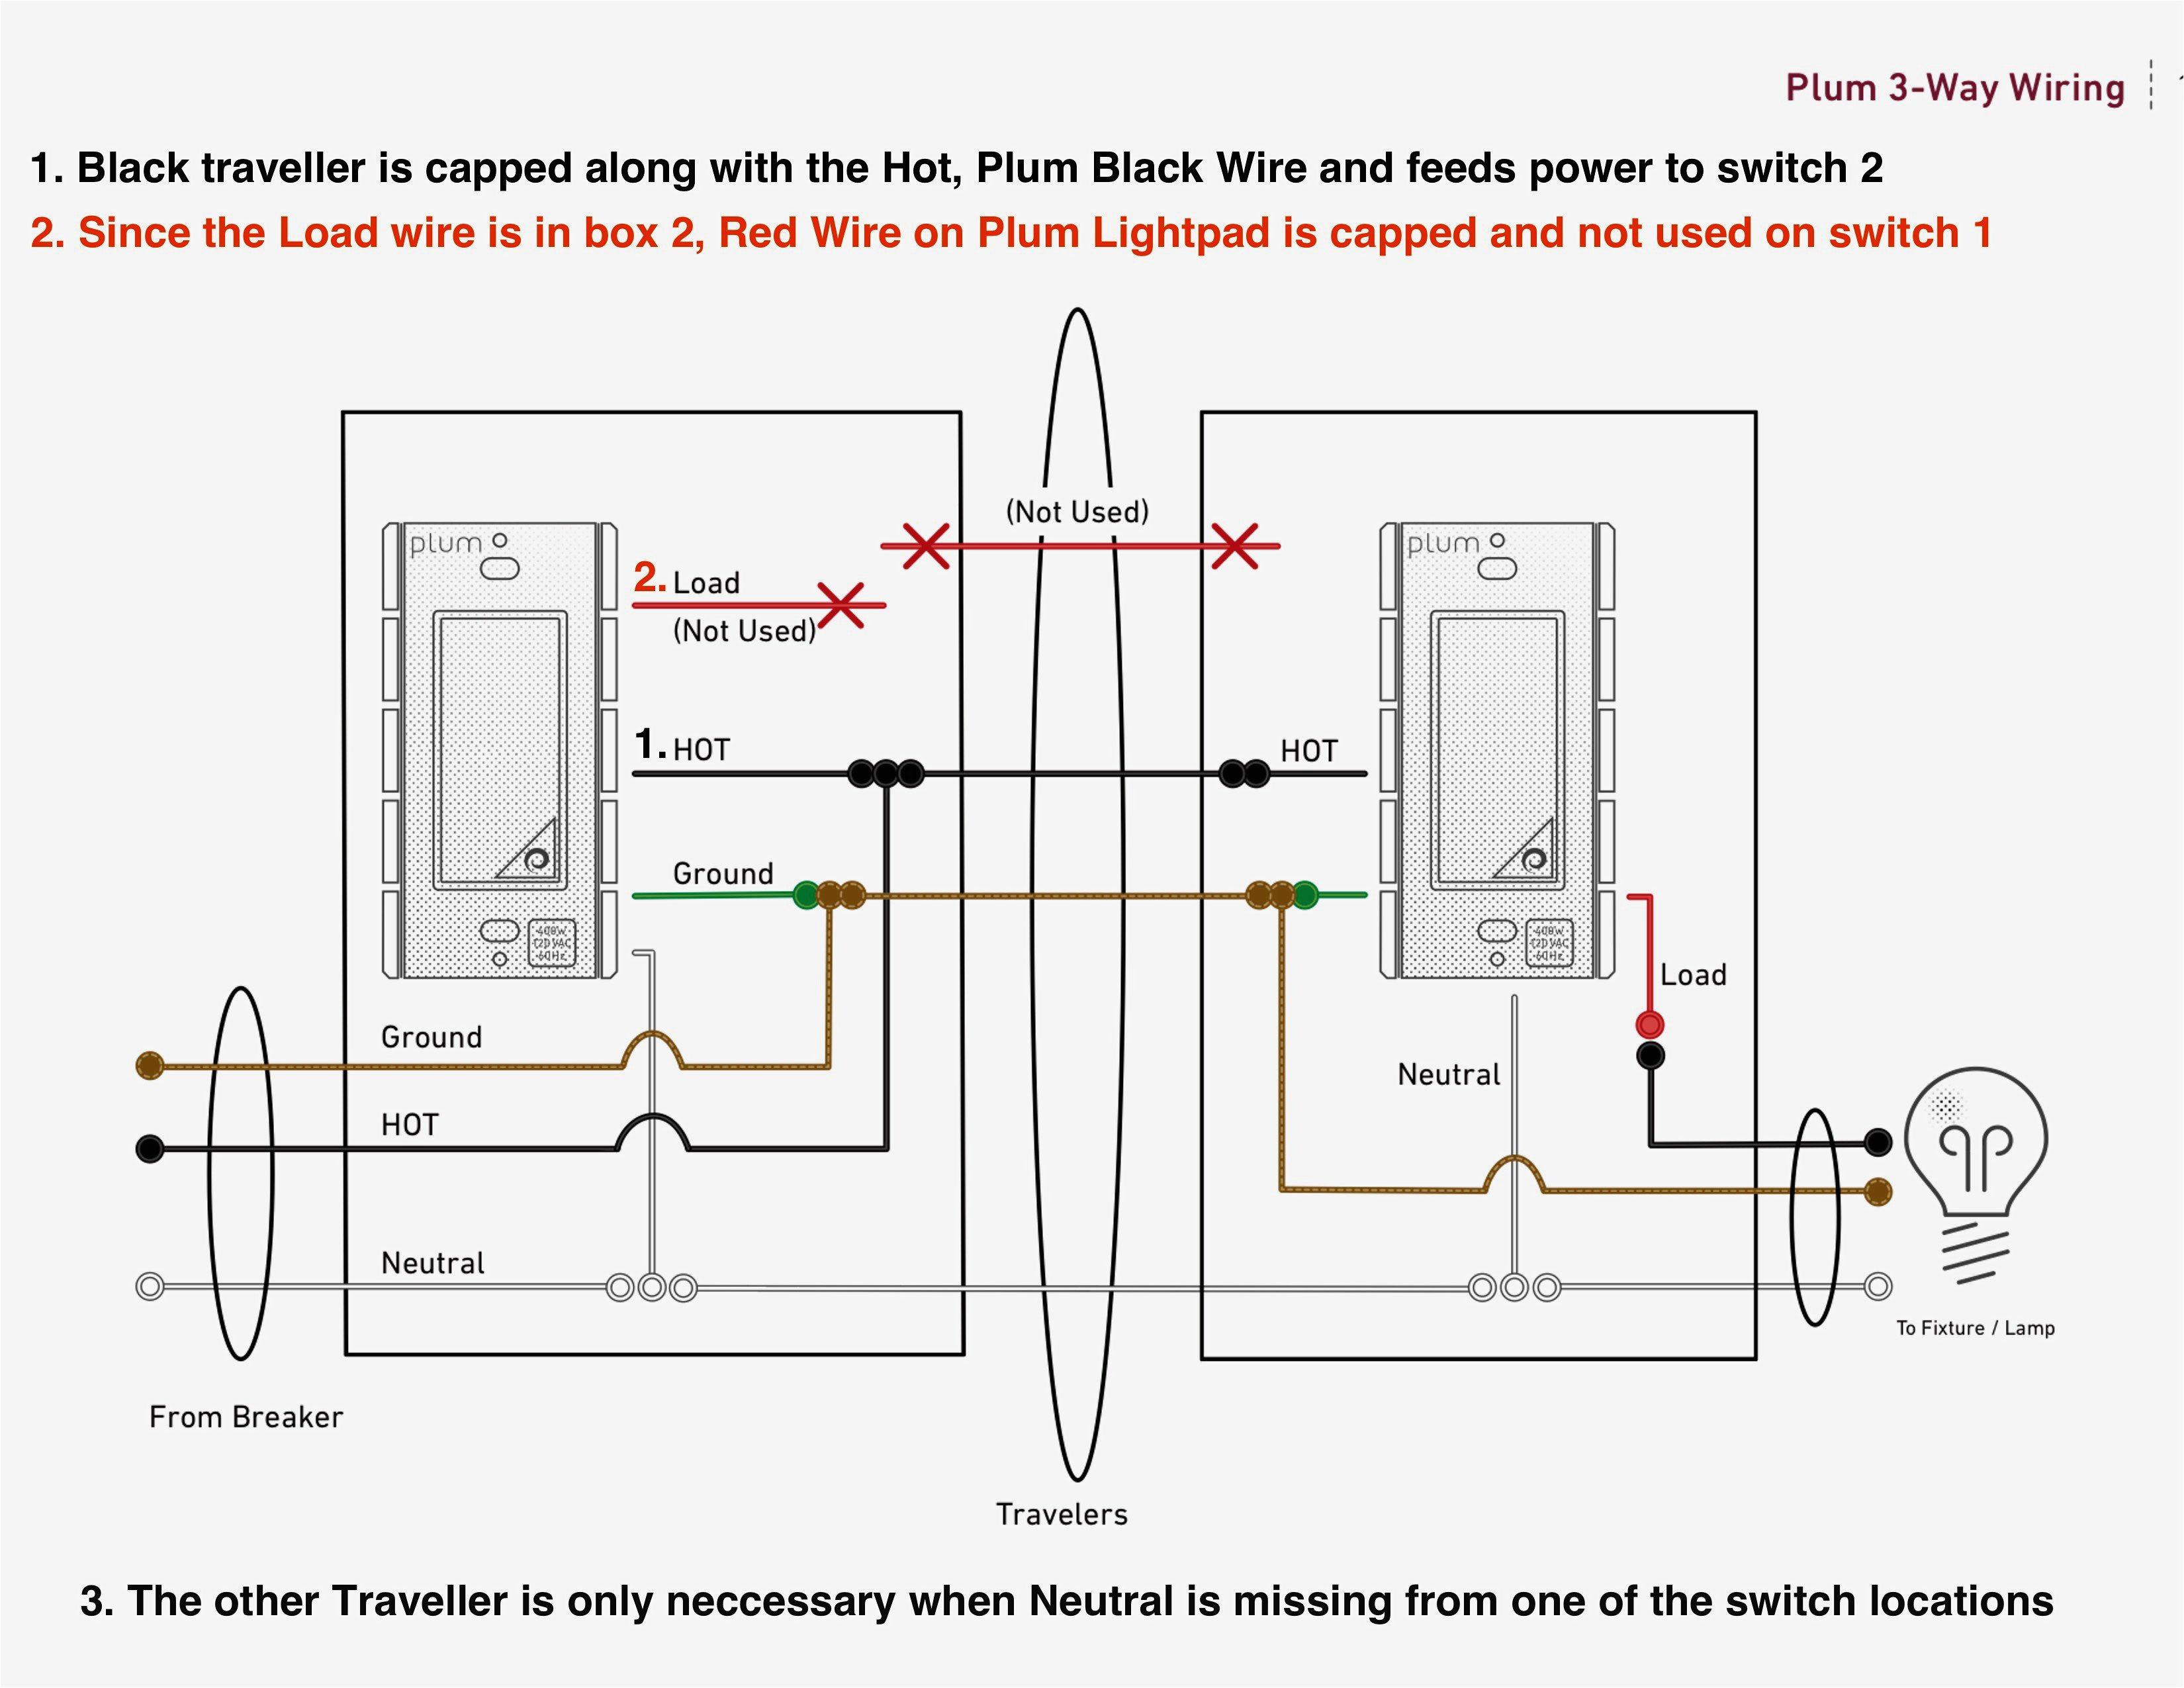 tortoise point motor wiring diagram lovely mcdonnell miller low water cutoff wiring diagram best tortoise